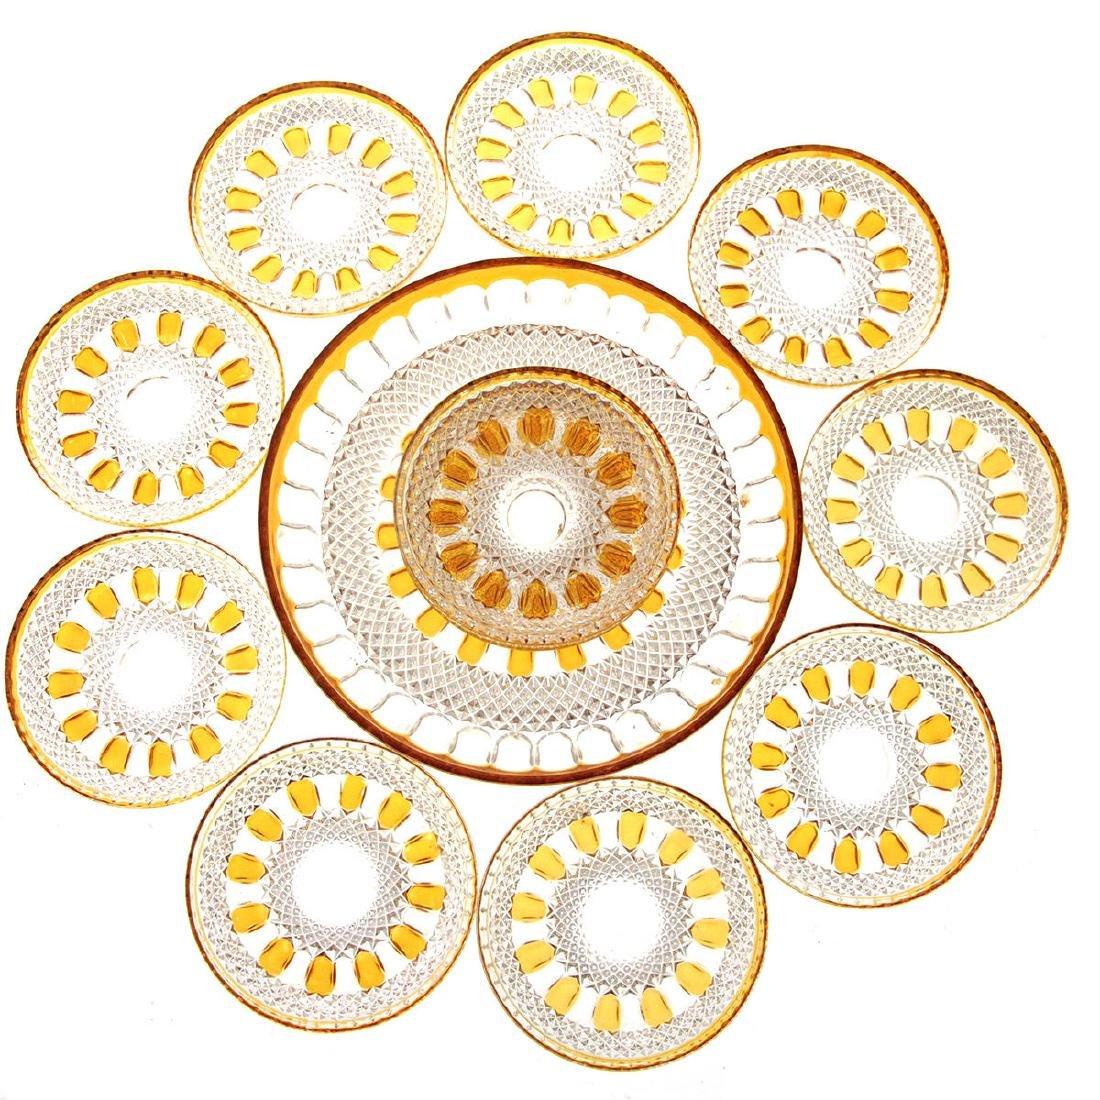 Bohemian Amber Crystal Plates Set.